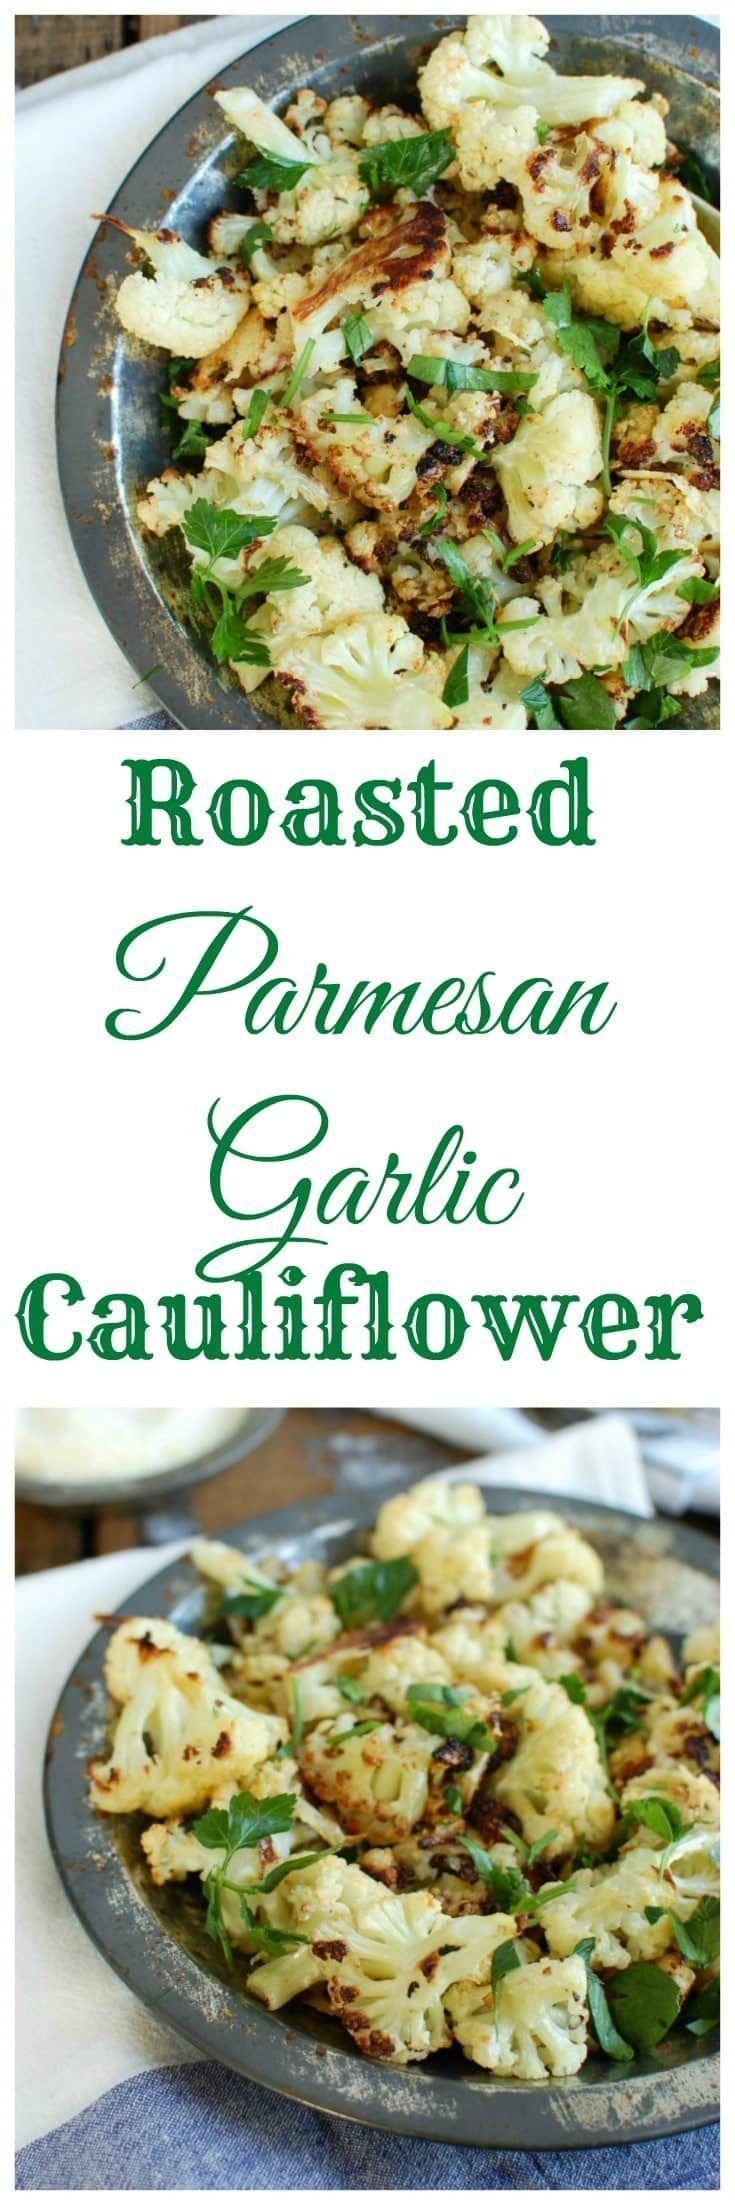 Wedding - Roasted Parmesan Garlic Cauliflower